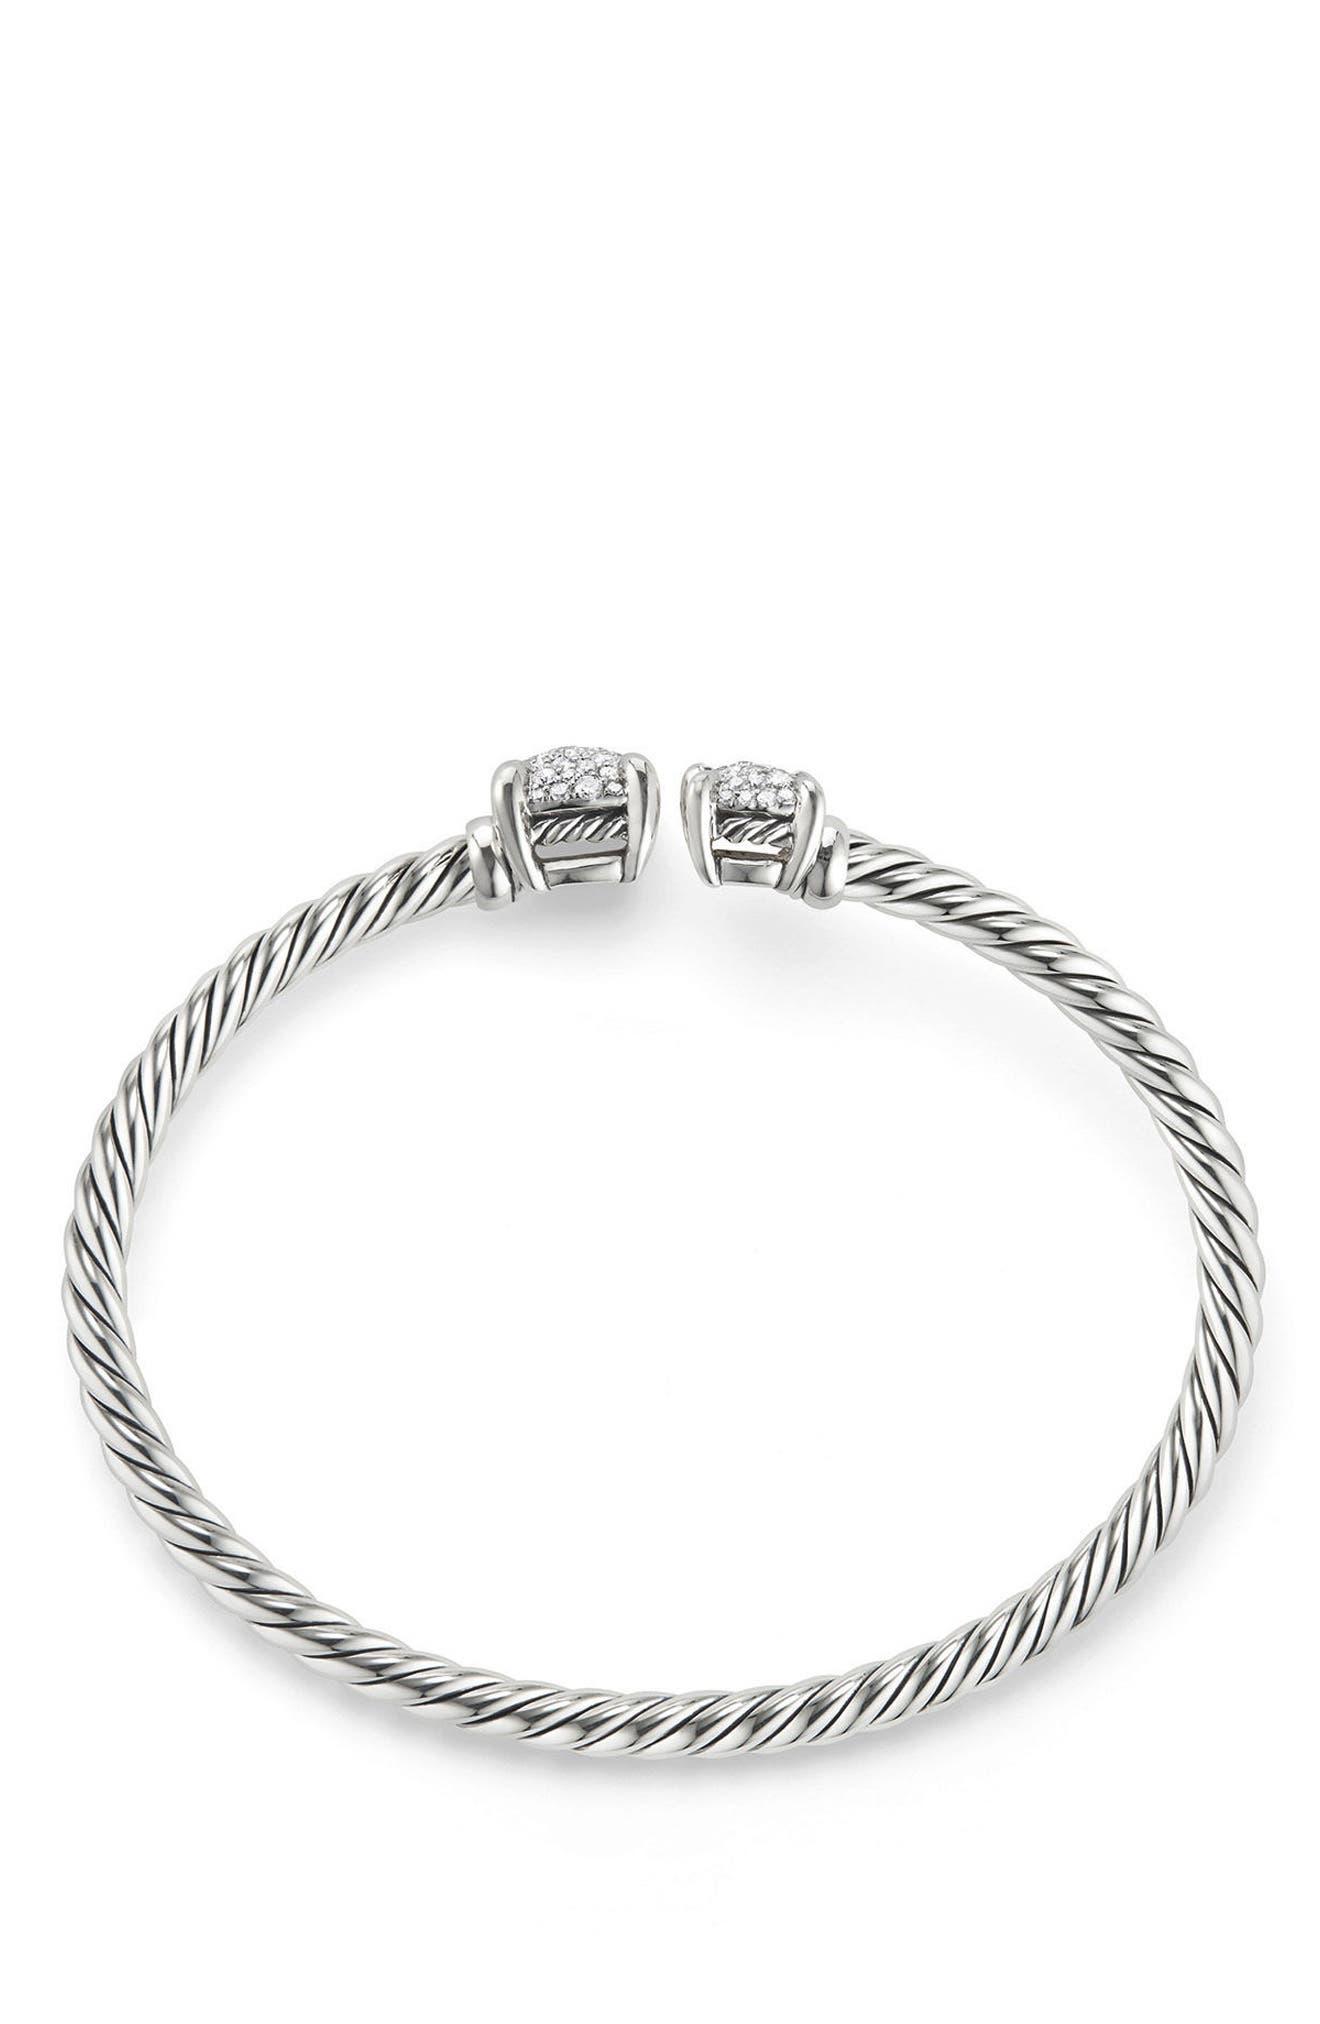 Châtelaine Bypass Bracelet with Diamonds,                             Alternate thumbnail 2, color,                             Silver